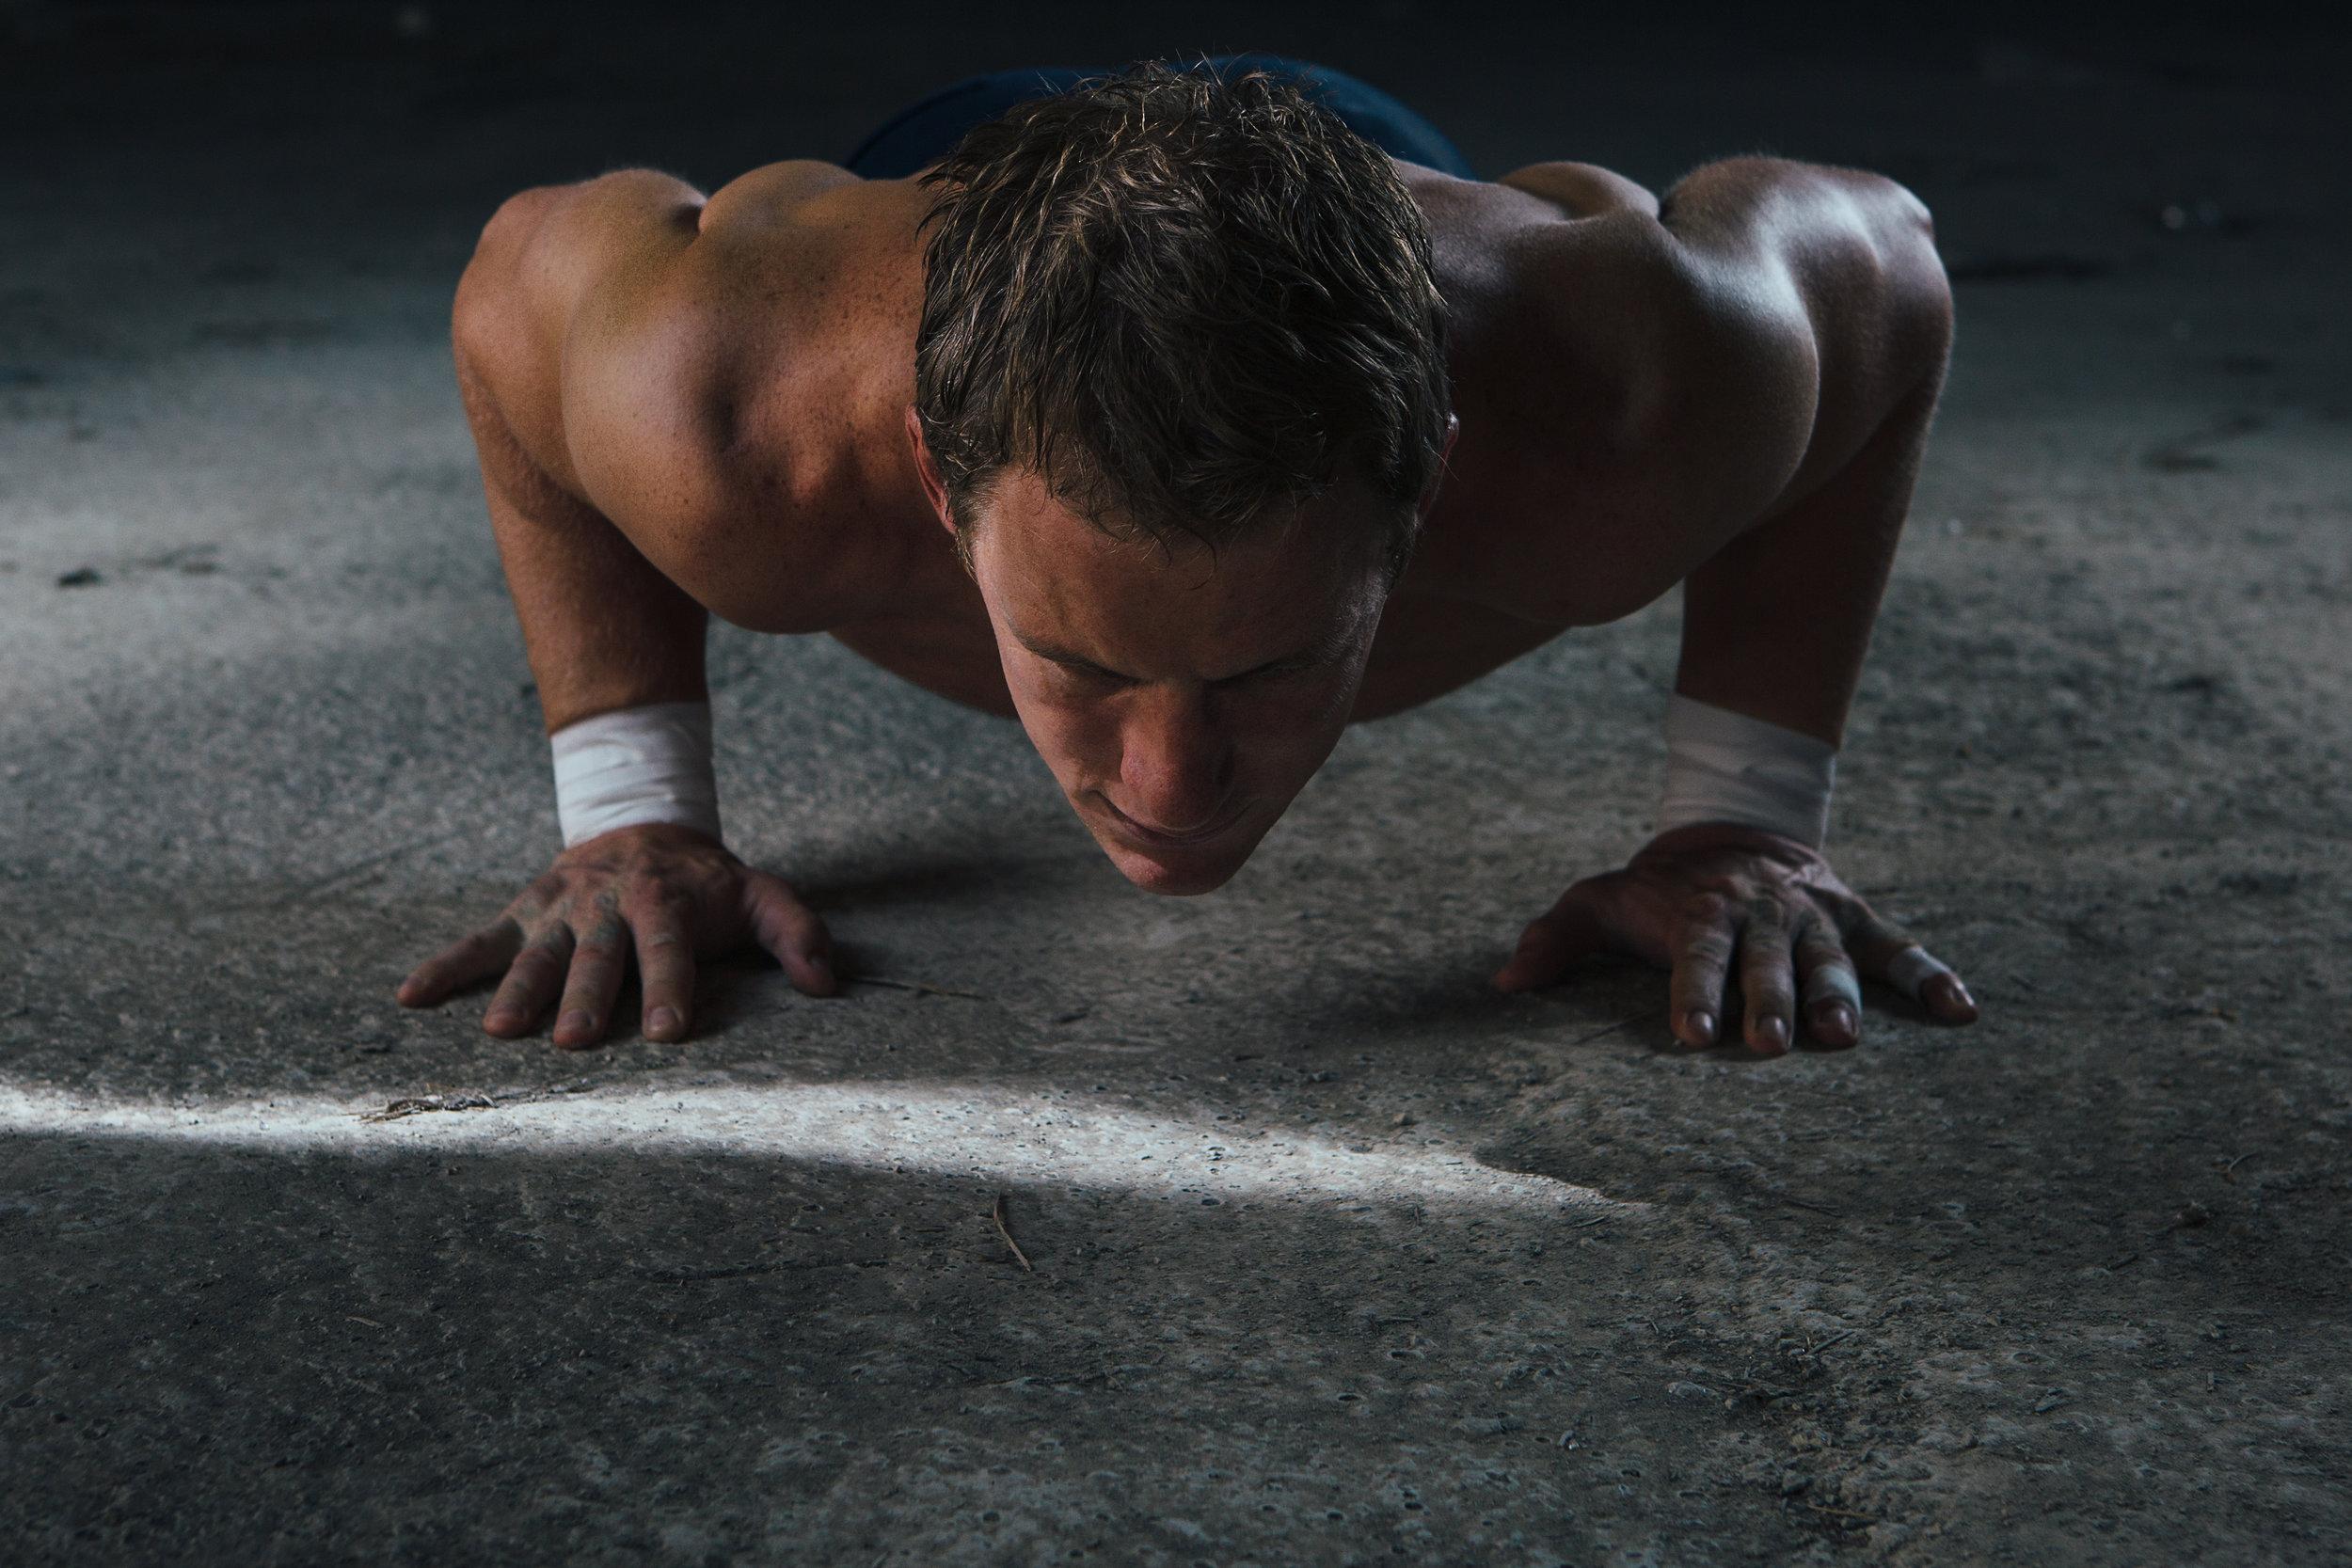 muscle-man-doing-push-ups-PEMDGLZ.jpg